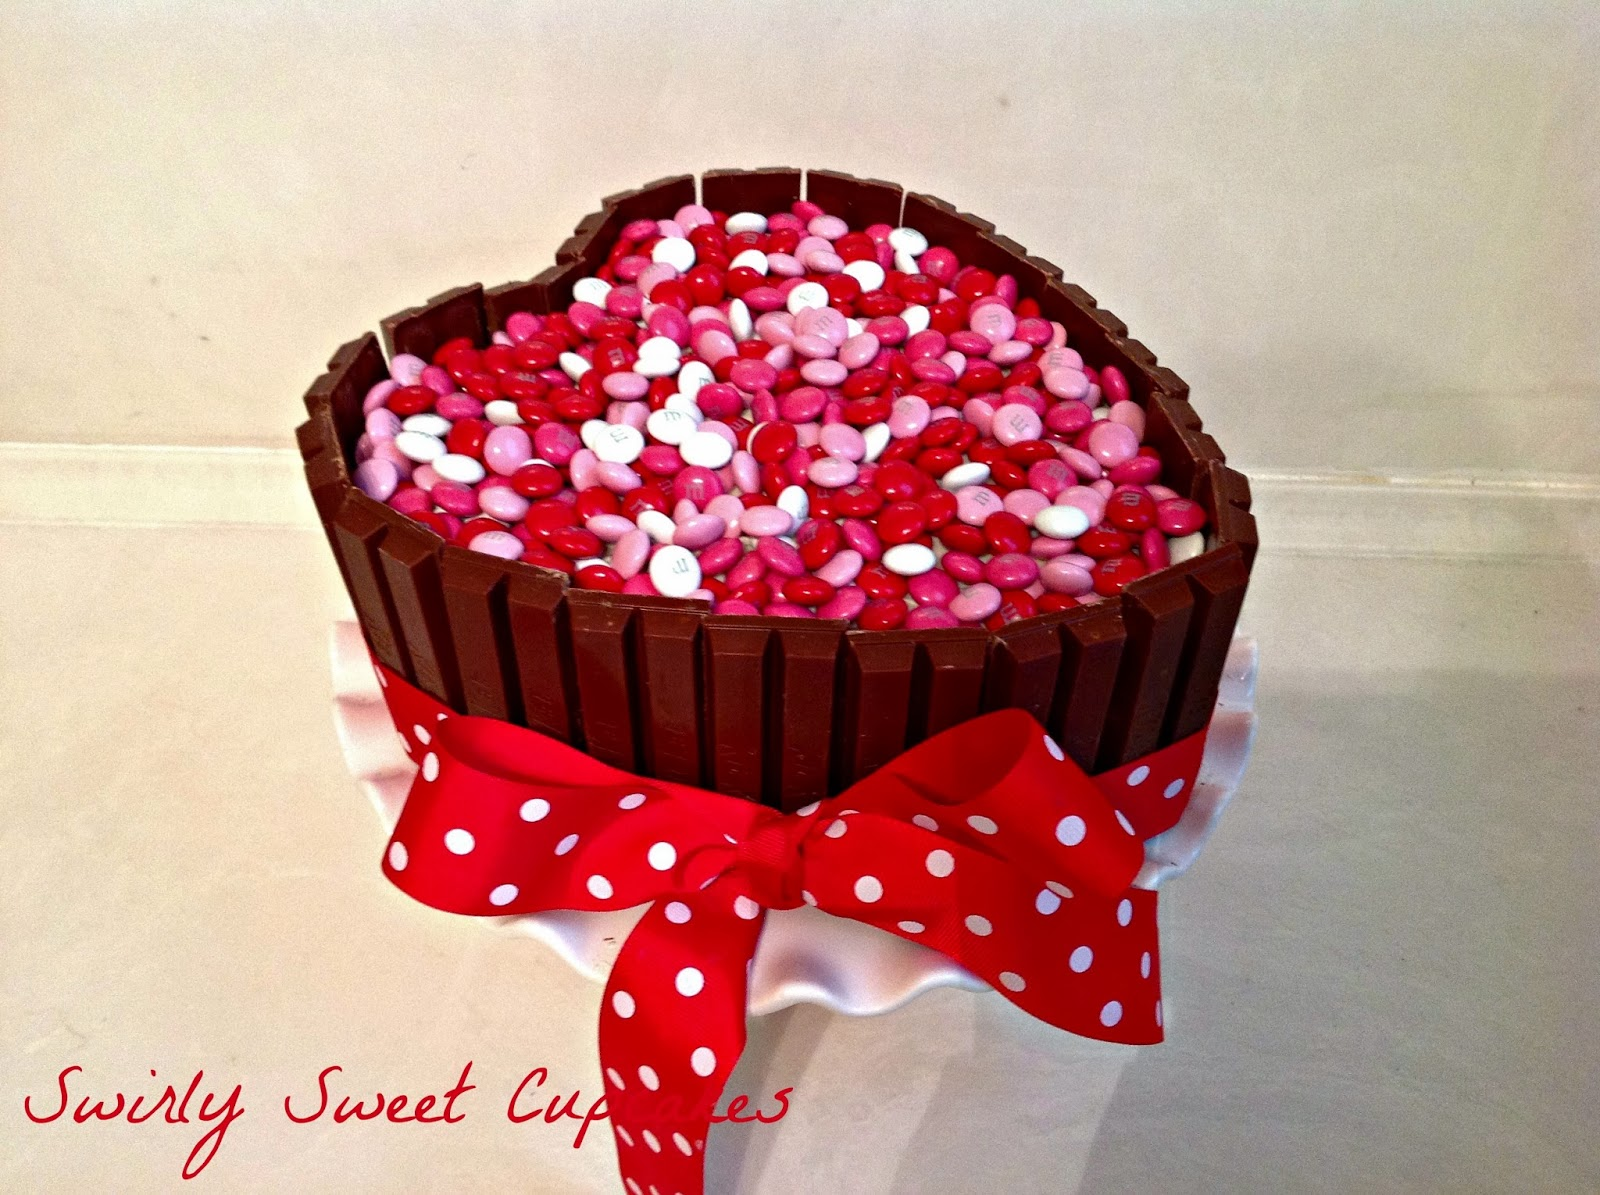 Swirly Sweet Cupcakes